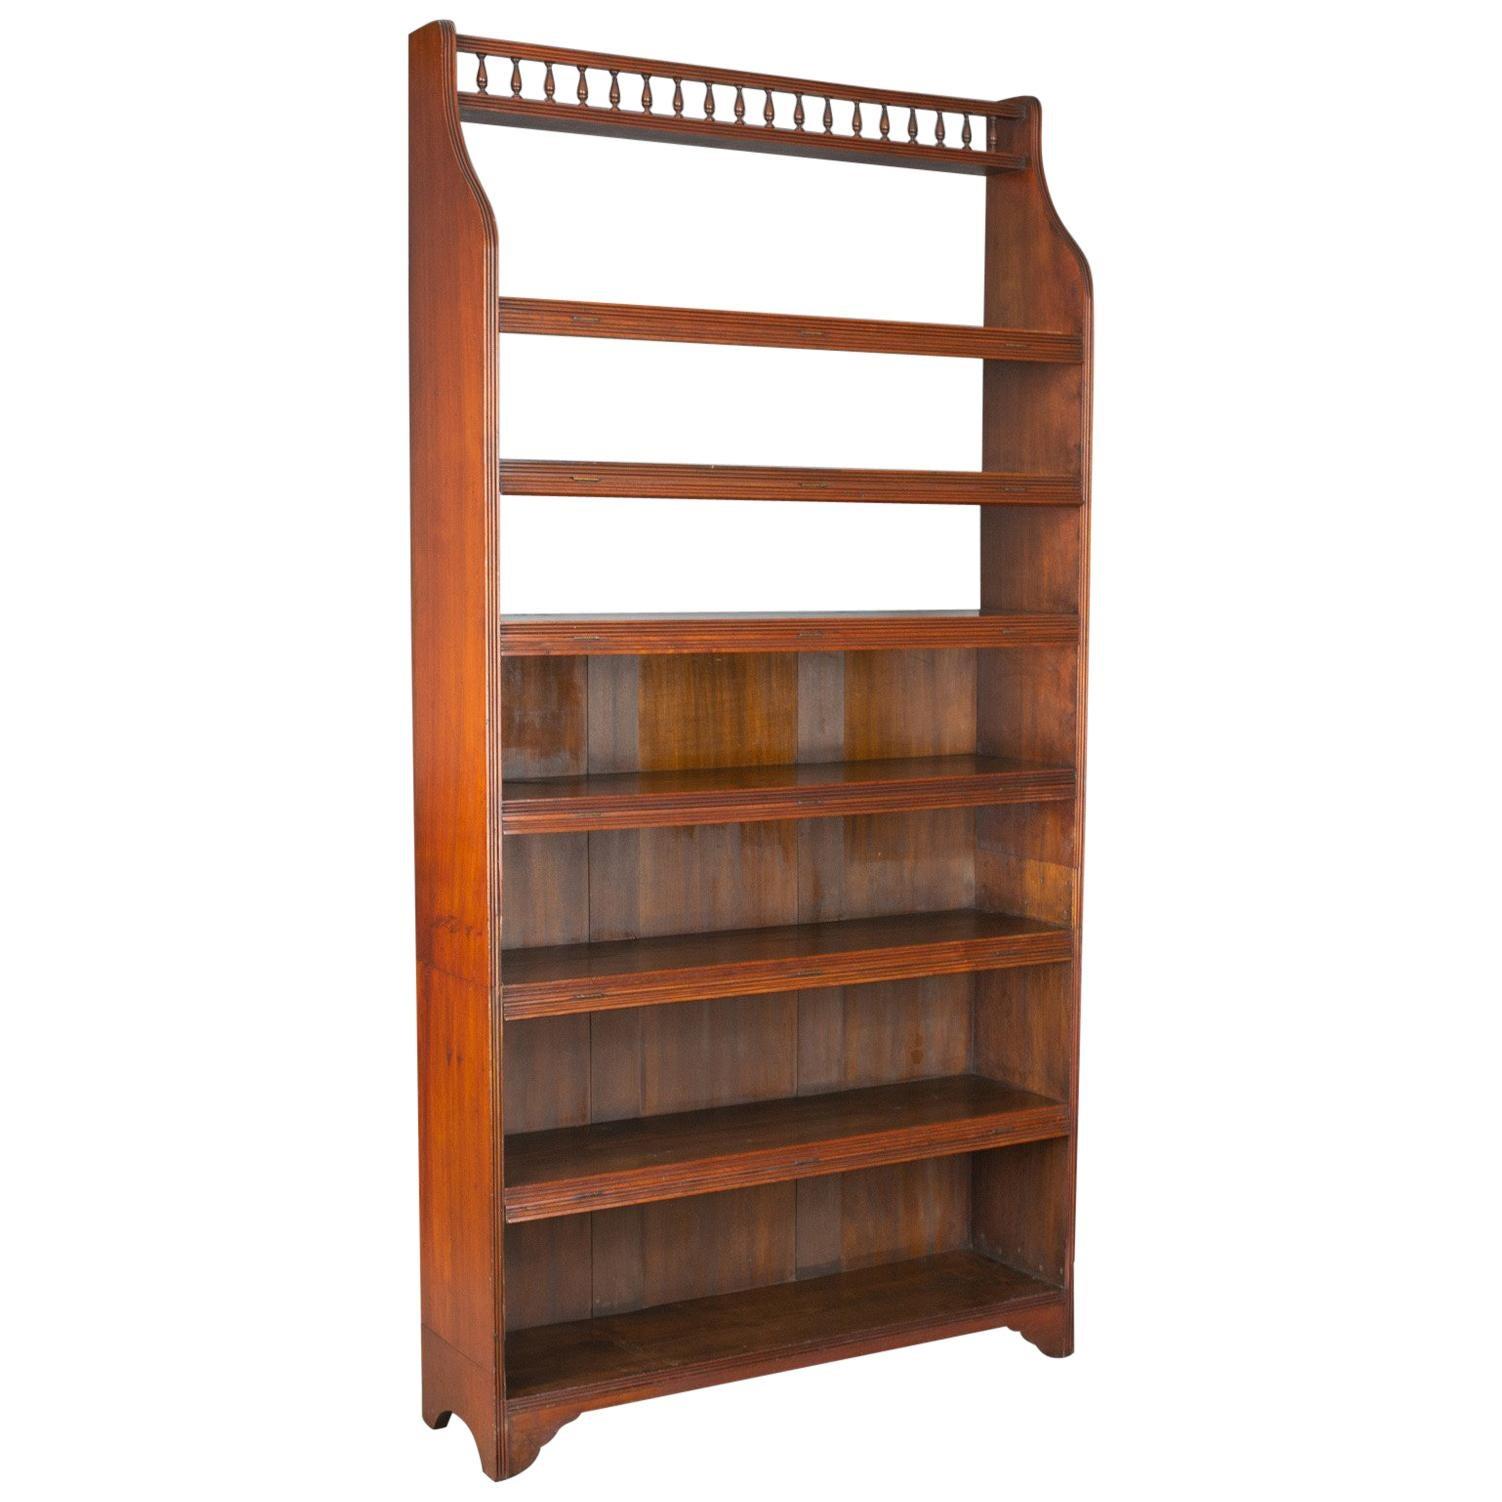 antique open bookcase tall english walnut book shelves rh 1stdibs com antique wood bookshelves antique pine book shelves